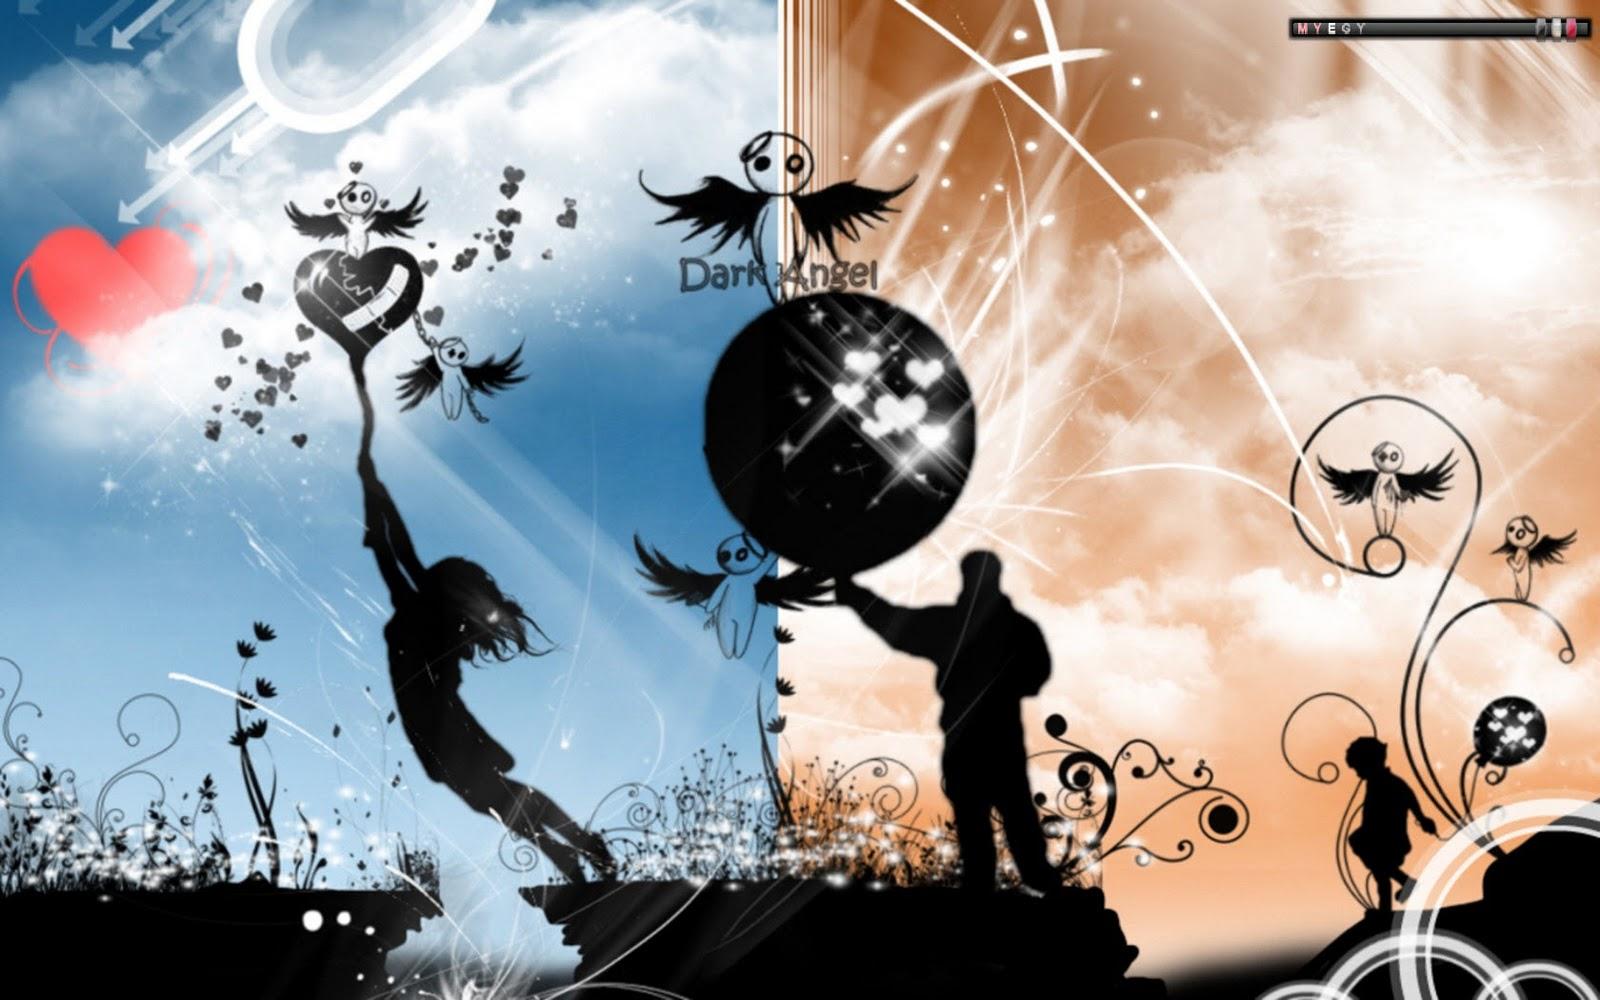 Hd free desktop background desktop backgrounds for windows - 3d anime wallpaper ...